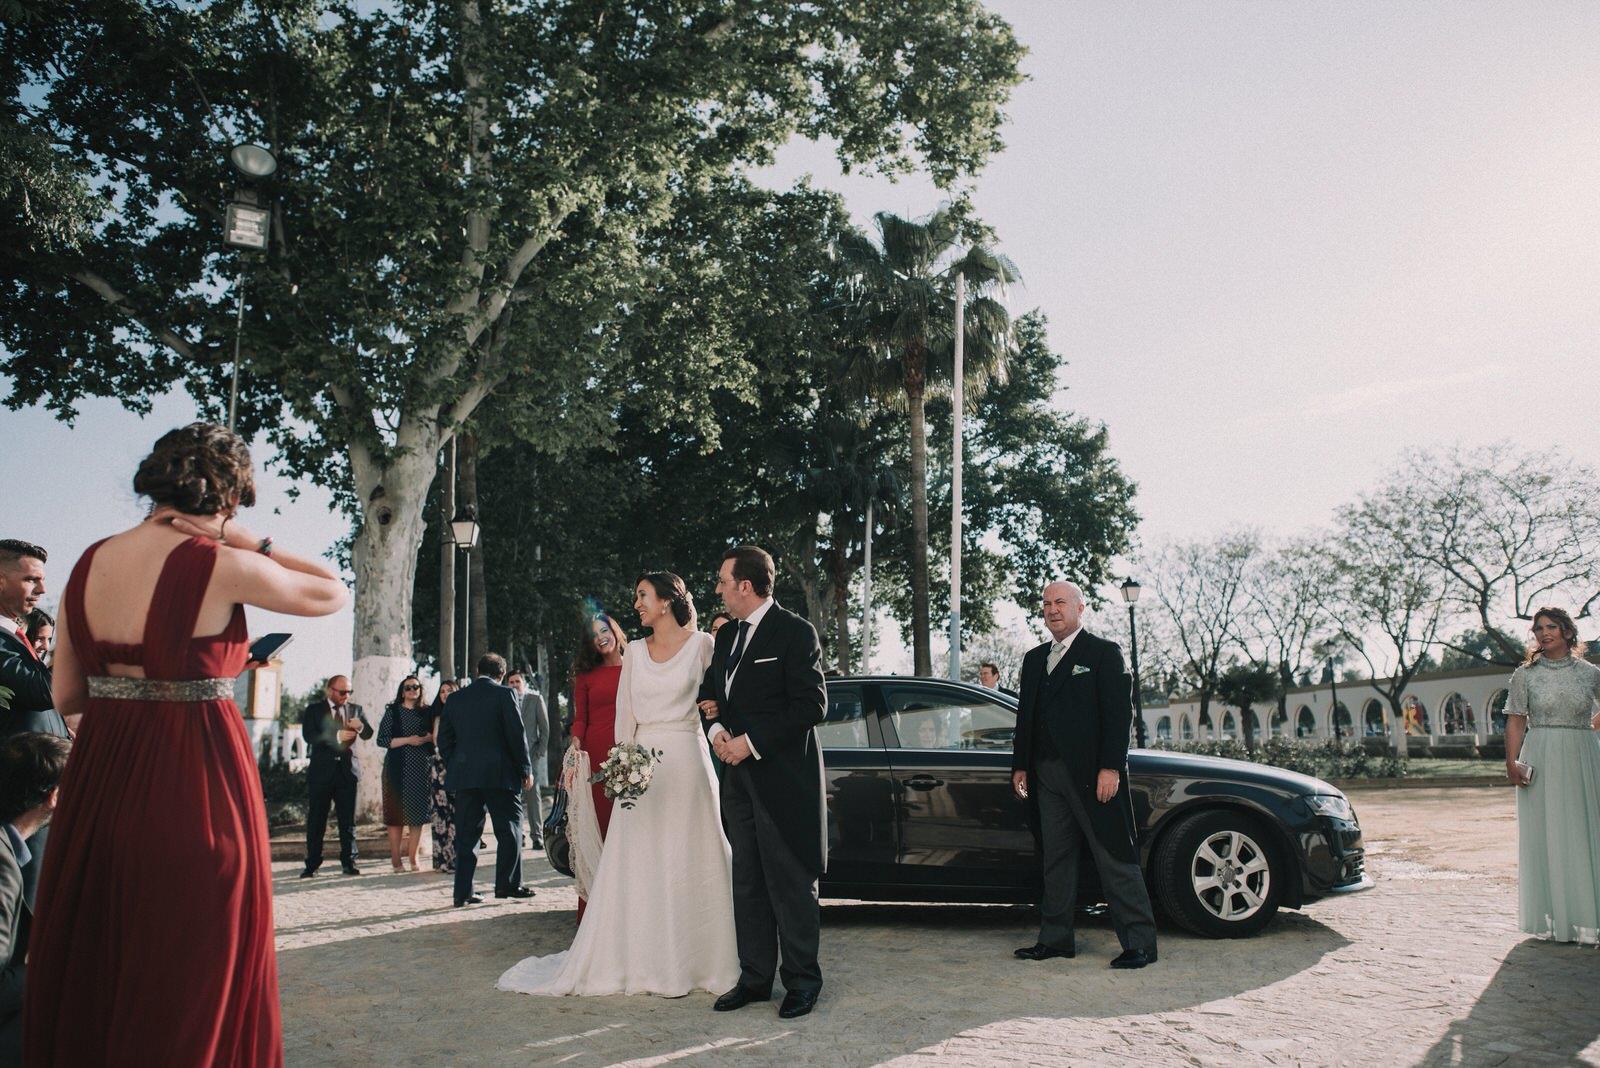 fotografo de bodas sevilla - fotografo boda - fotografía sevilla - Andrés AmarilloAAA_2938- fine.JPG